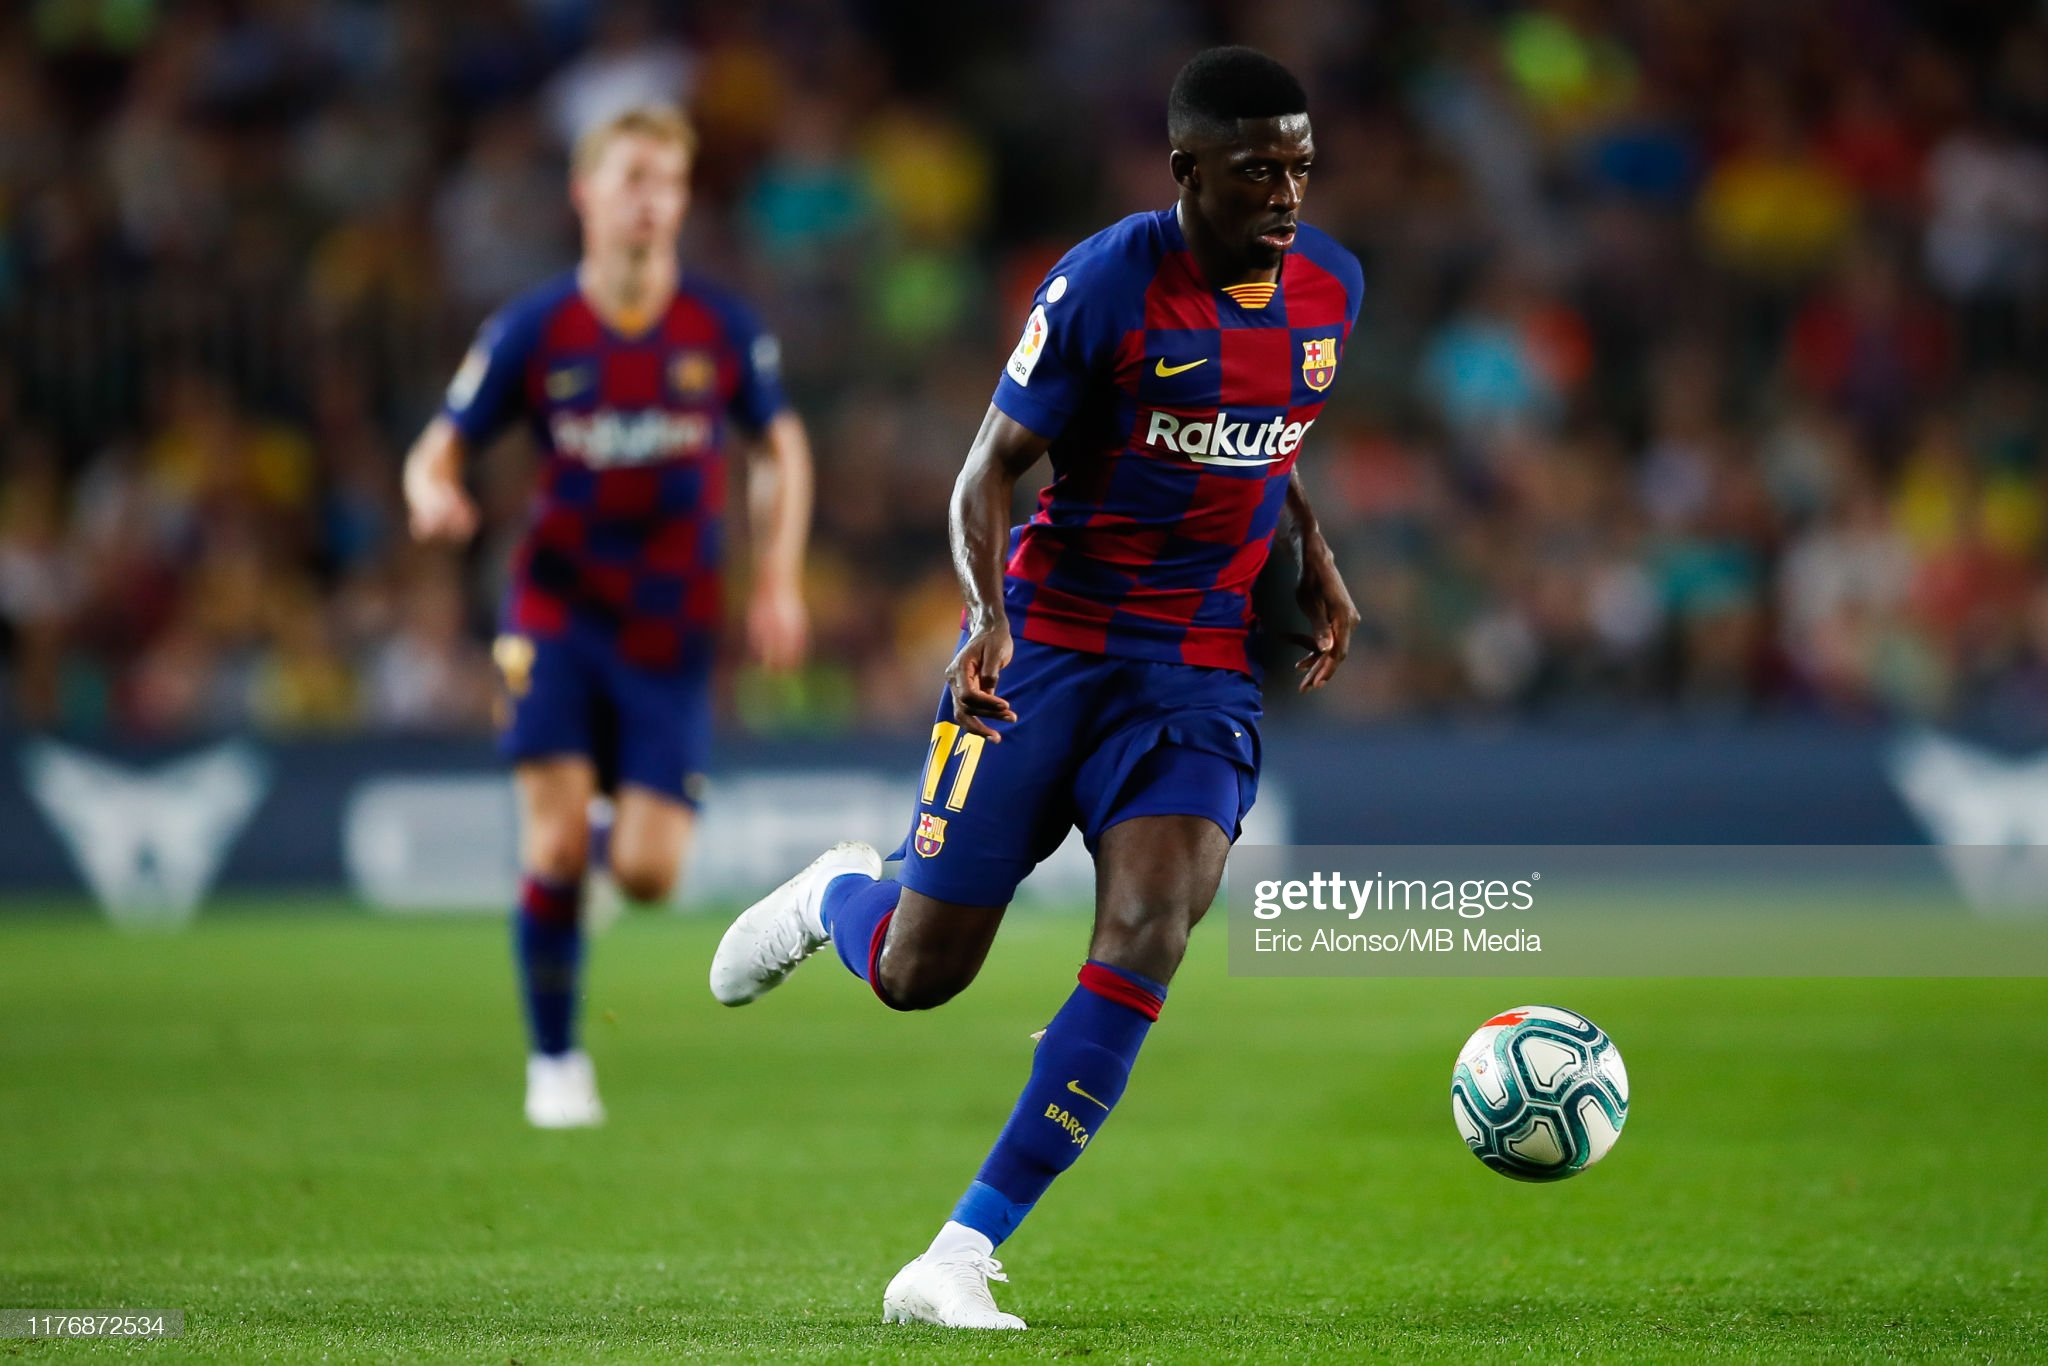 صور مباراة : برشلونة - فياريال 2-1 ( 24-09-2019 )  Ousmane-demebele-of-fc-barcelona-controls-the-ball-during-the-liga-picture-id1176872534?s=2048x2048